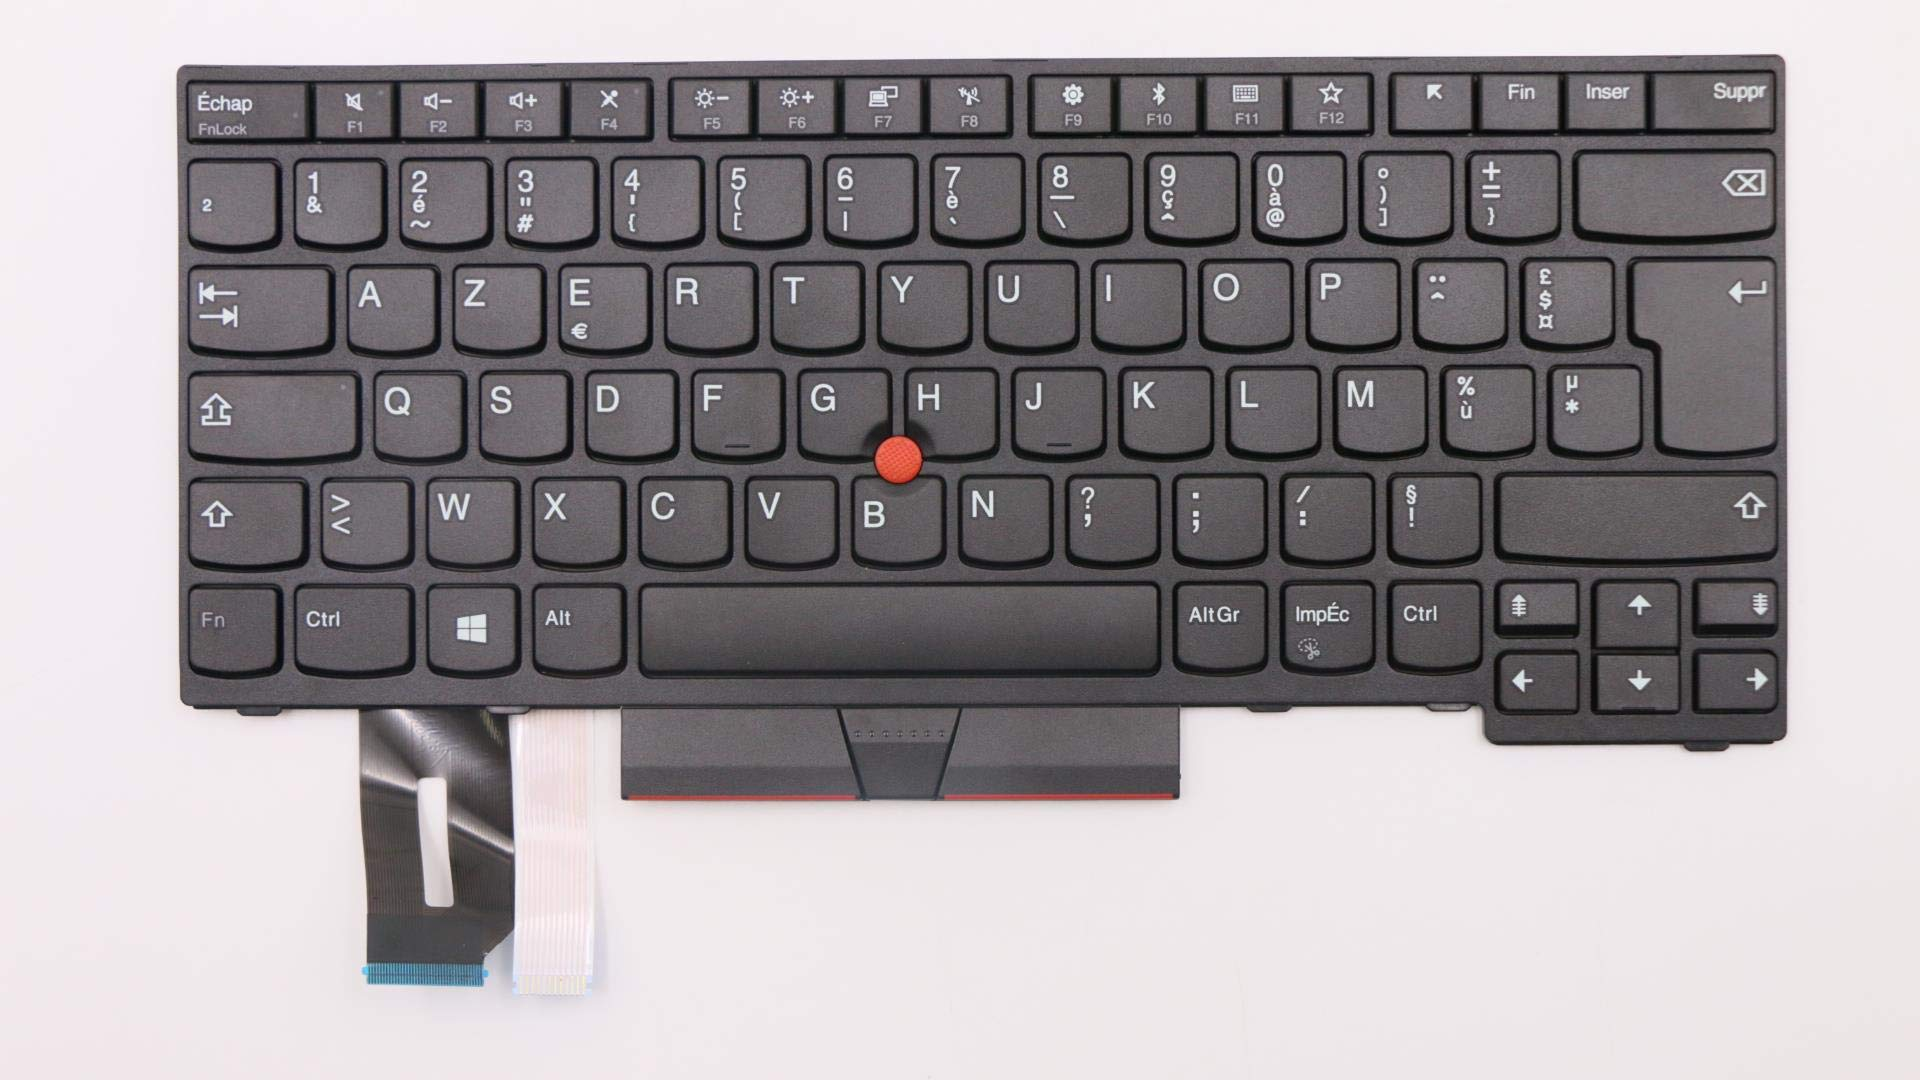 Teclado USA No Retroiluminado para Lenovo ThinkPad T480s, T4